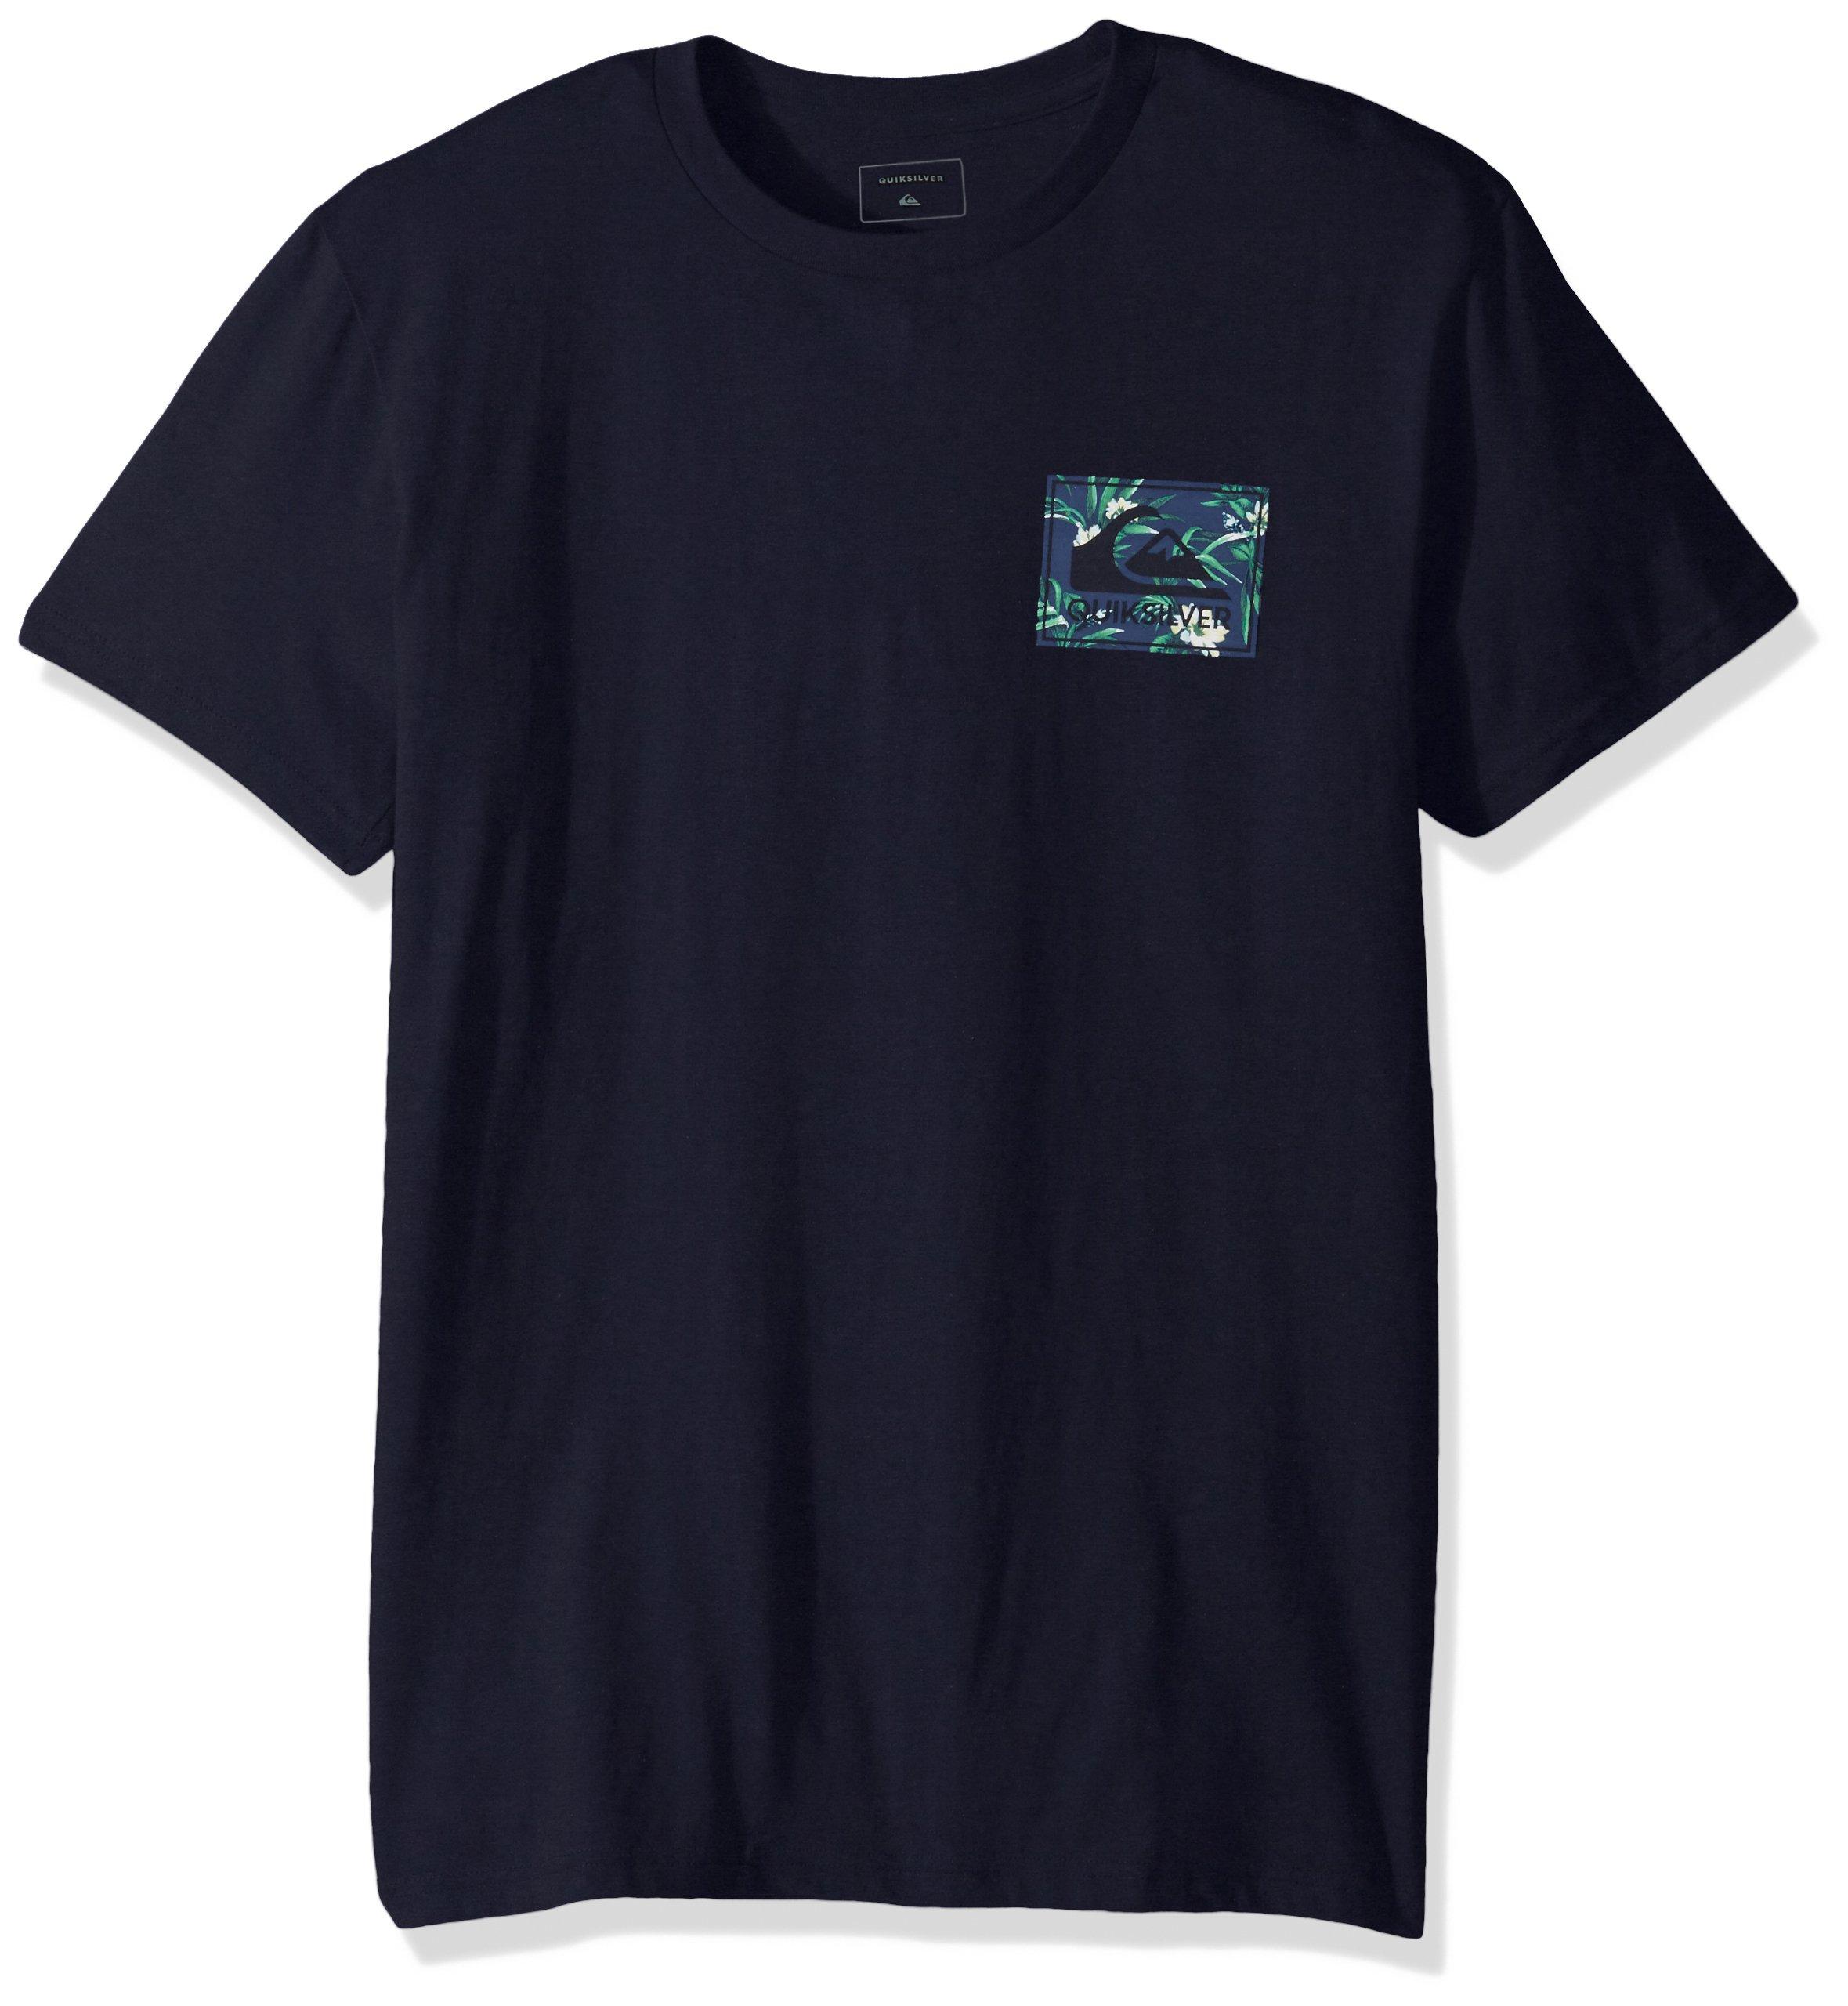 Quiksilver Men's Floral Feels T-Shirt, Navy Blazer, M